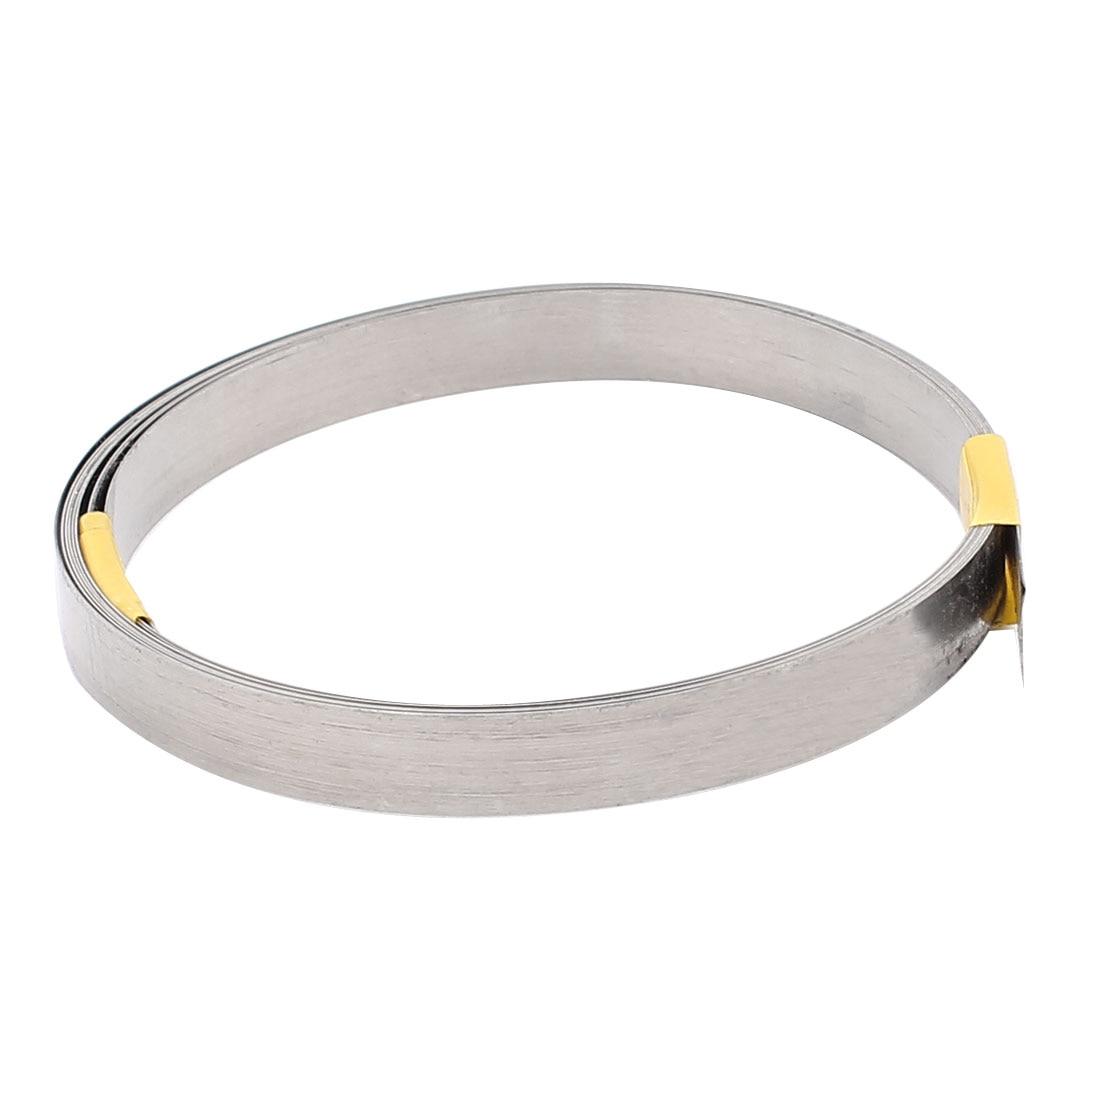 Uxcell 2M 6.6Ft 0.2X8mm Nichrome Flat Heater Wire For Heating Elements Length . | 2m | 305cm | 3m | 5m | 750cm икона янтарная богородица скоропослушница кян 2 305